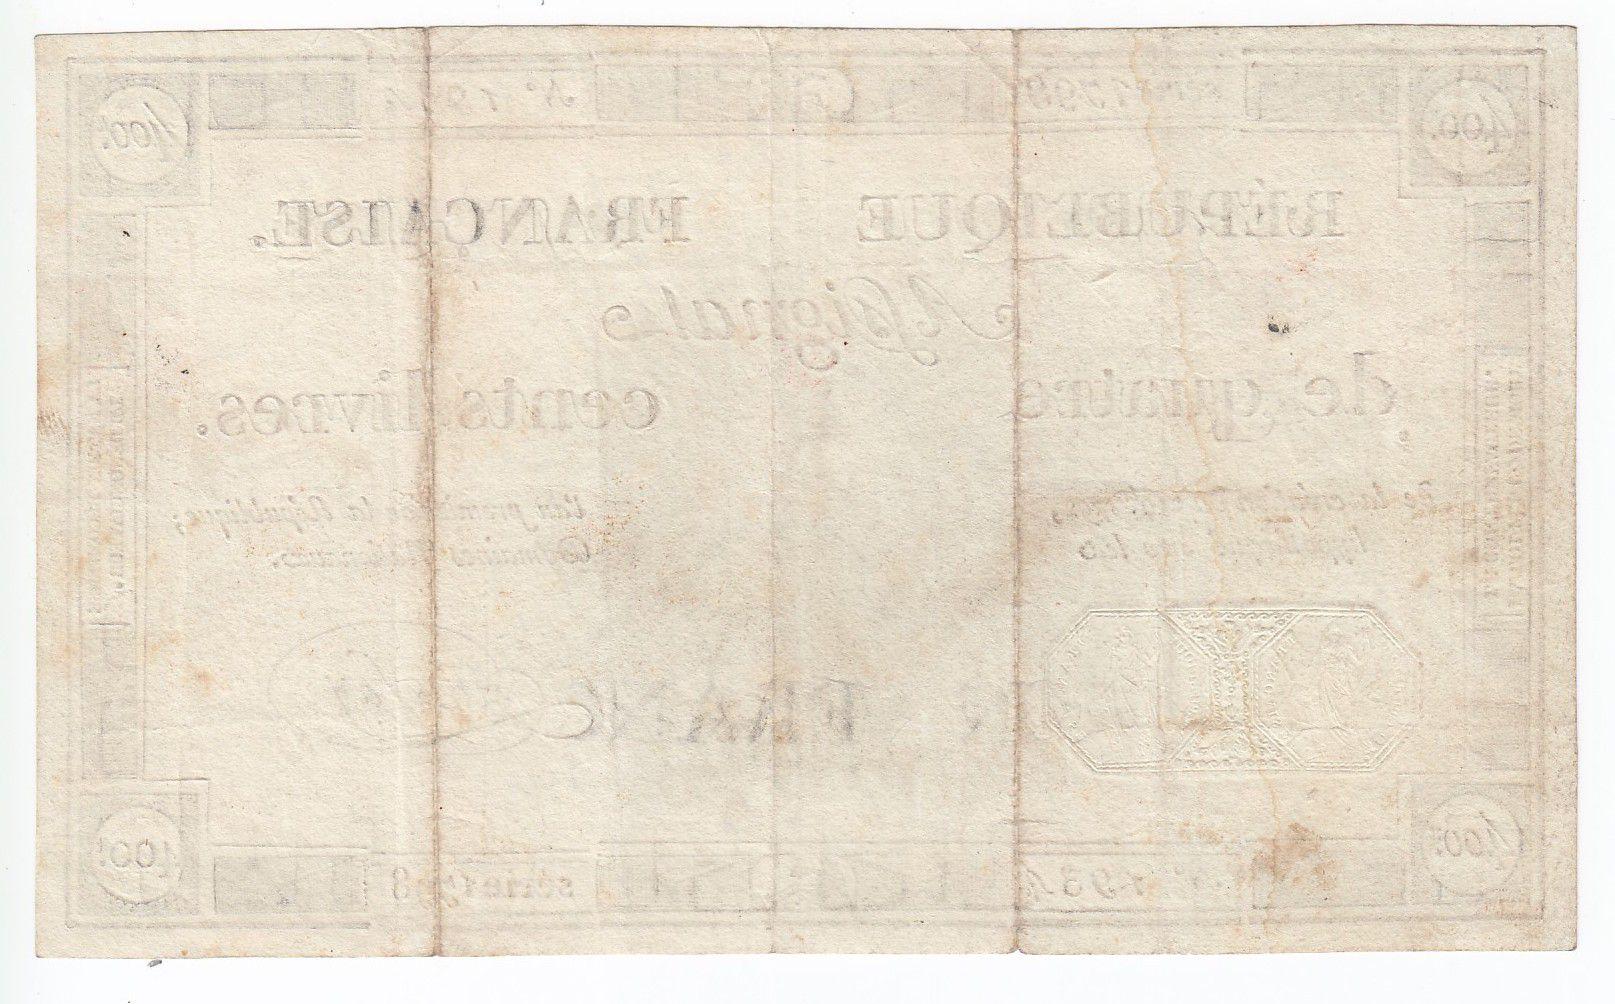 France 400 Livres 21-11-1792 - Sign. Say - Serial 1798 - VF